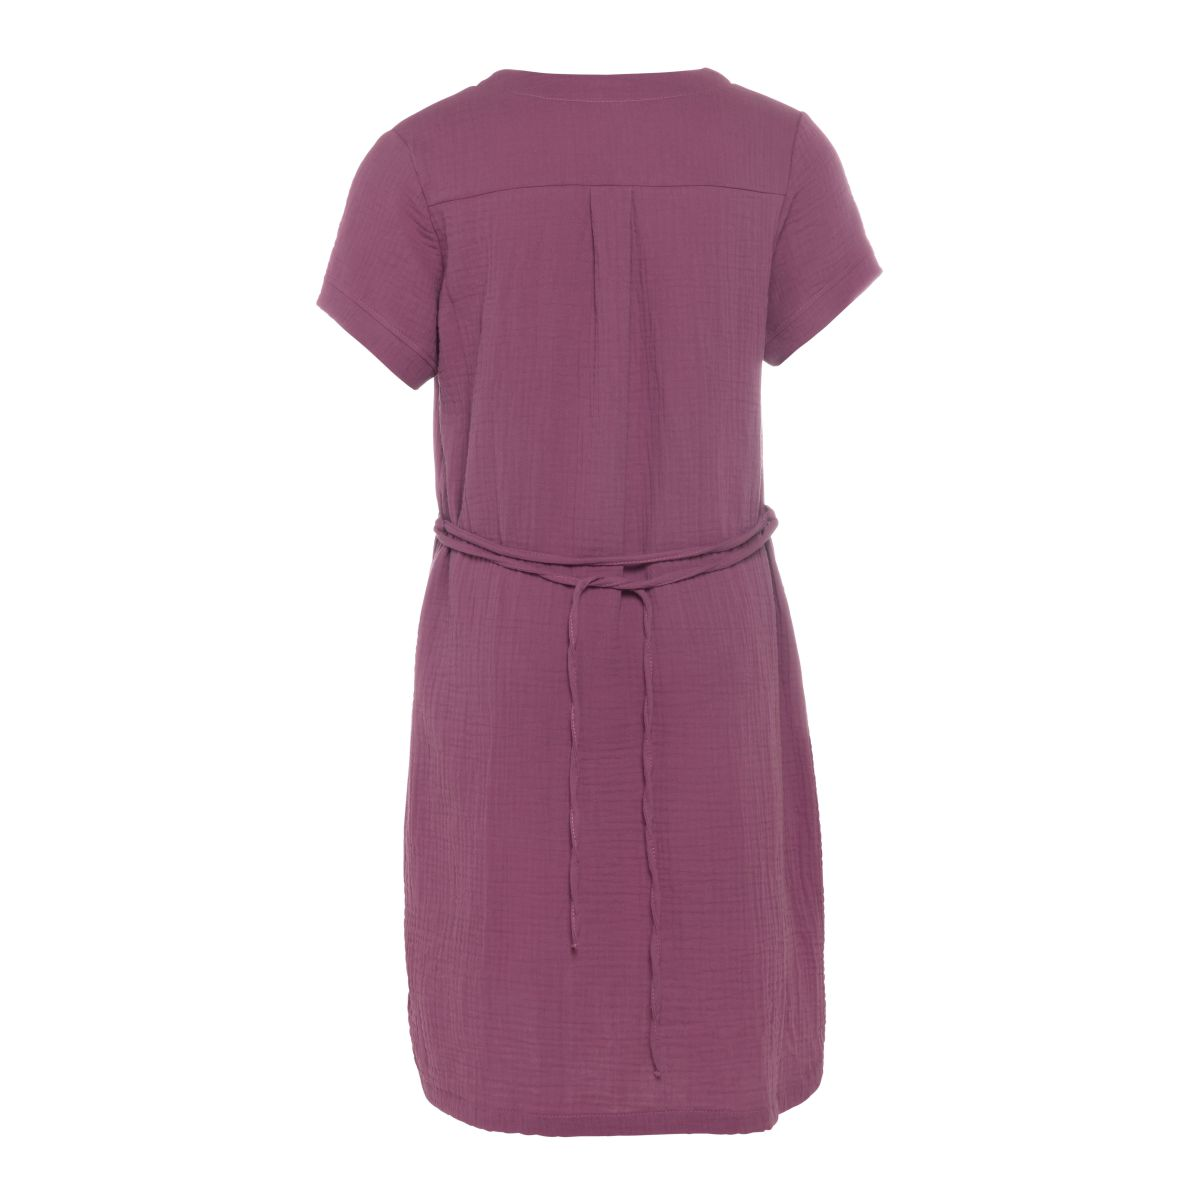 knit factory kf15012004352 indy jurk purple xl 2